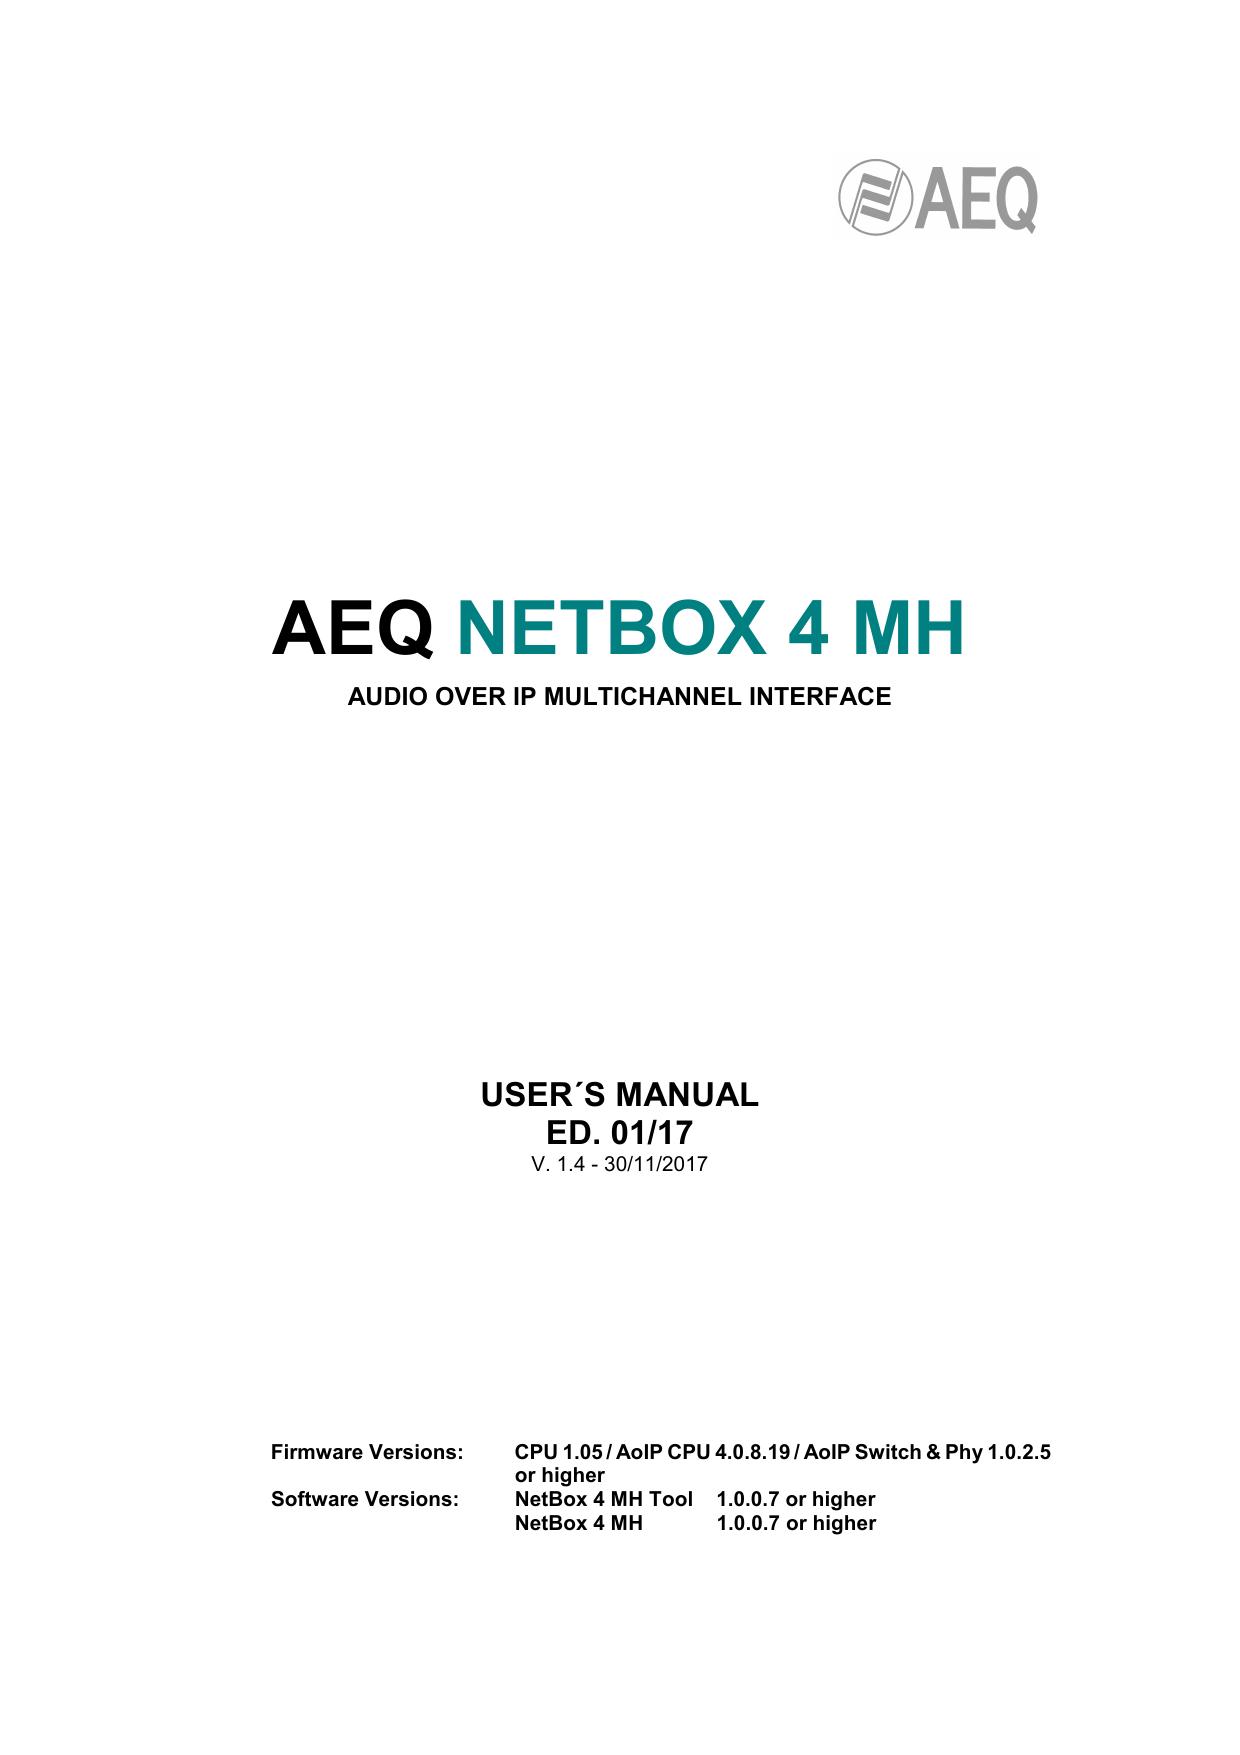 AEQ NETBOX 4 MH Users Manual | manualzz com